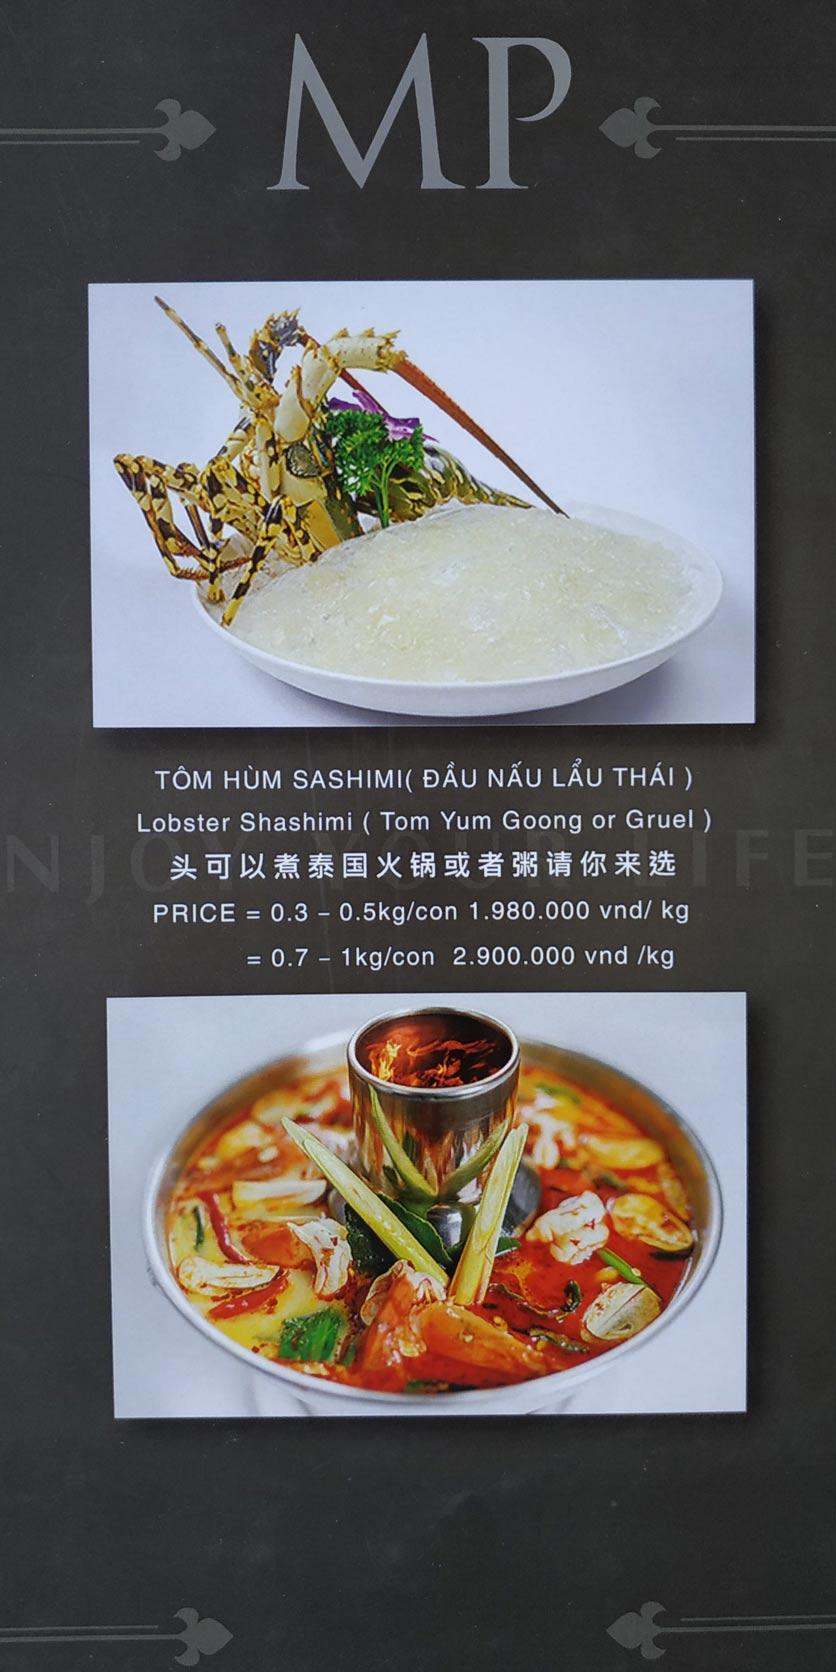 Menu MP Thai Seafood Restaurant - Phạm Văn Đồng 4